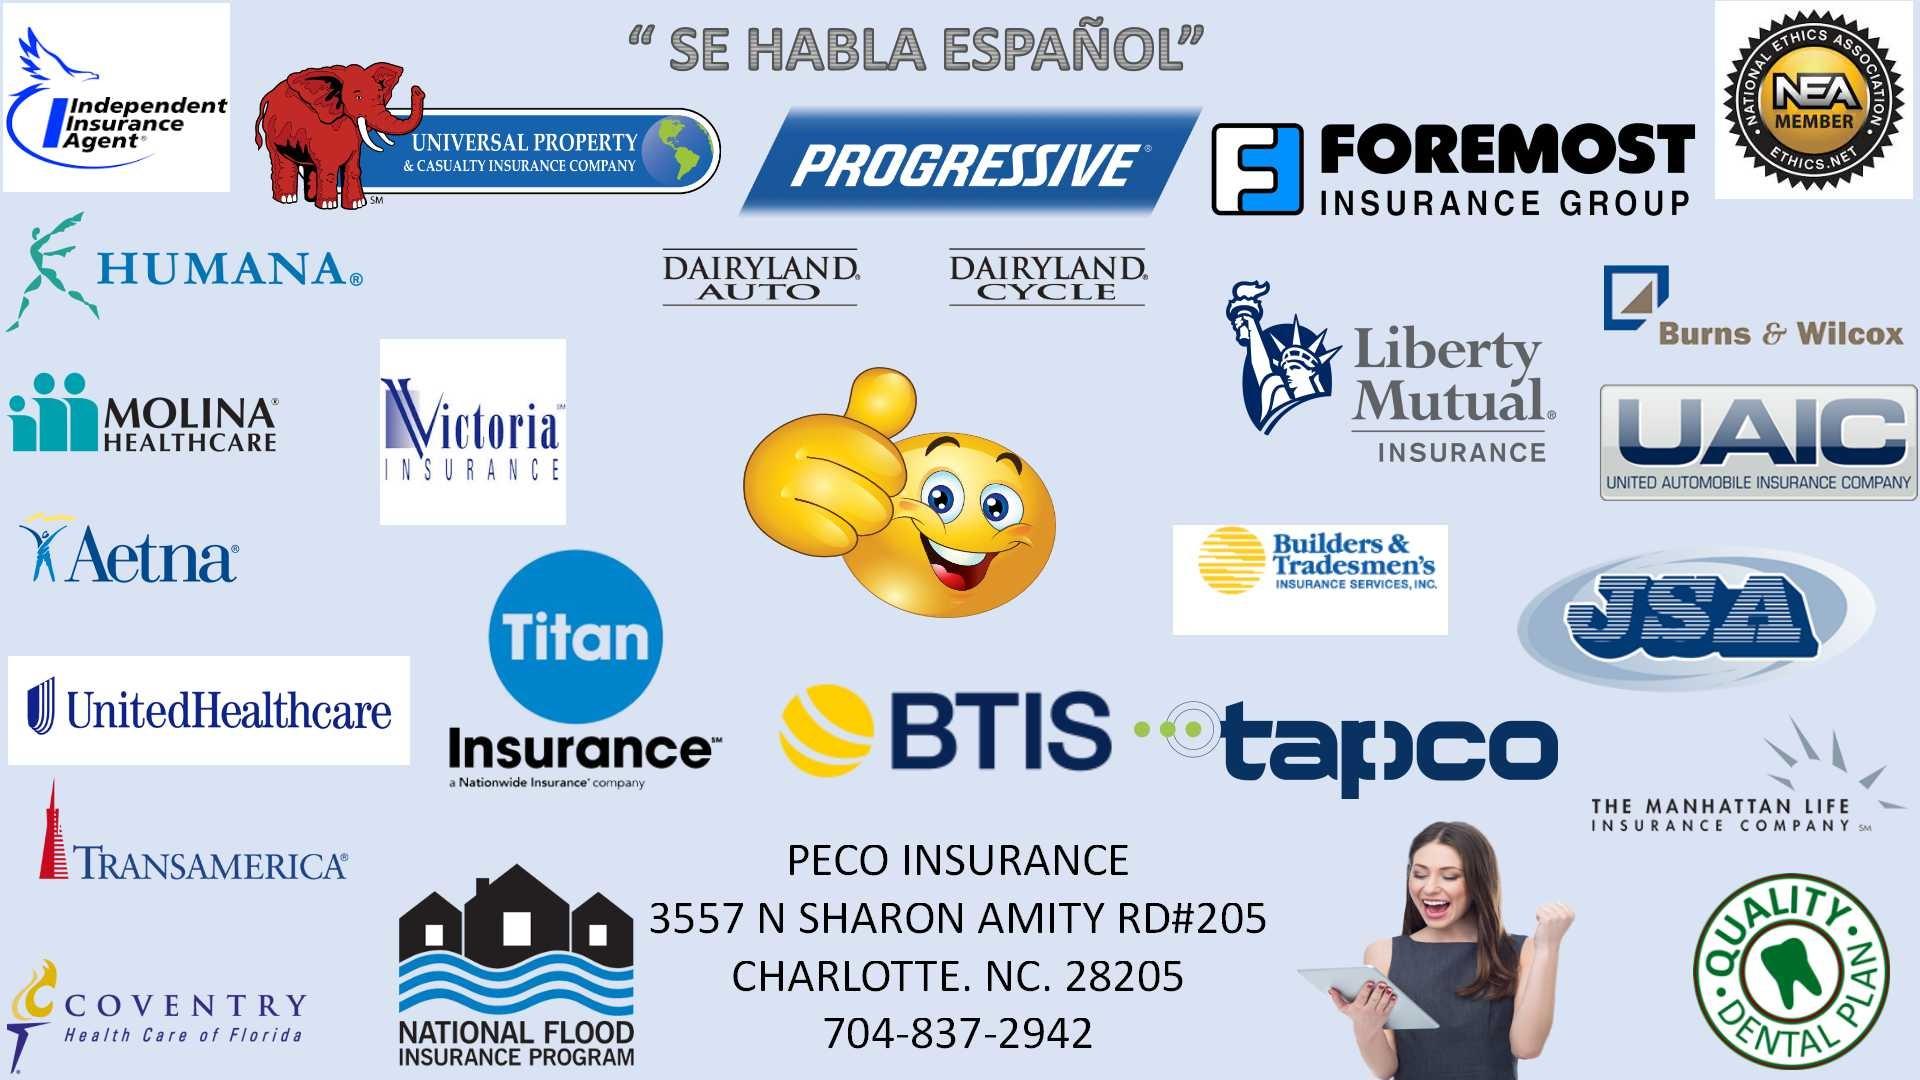 Peco Insurance image 6